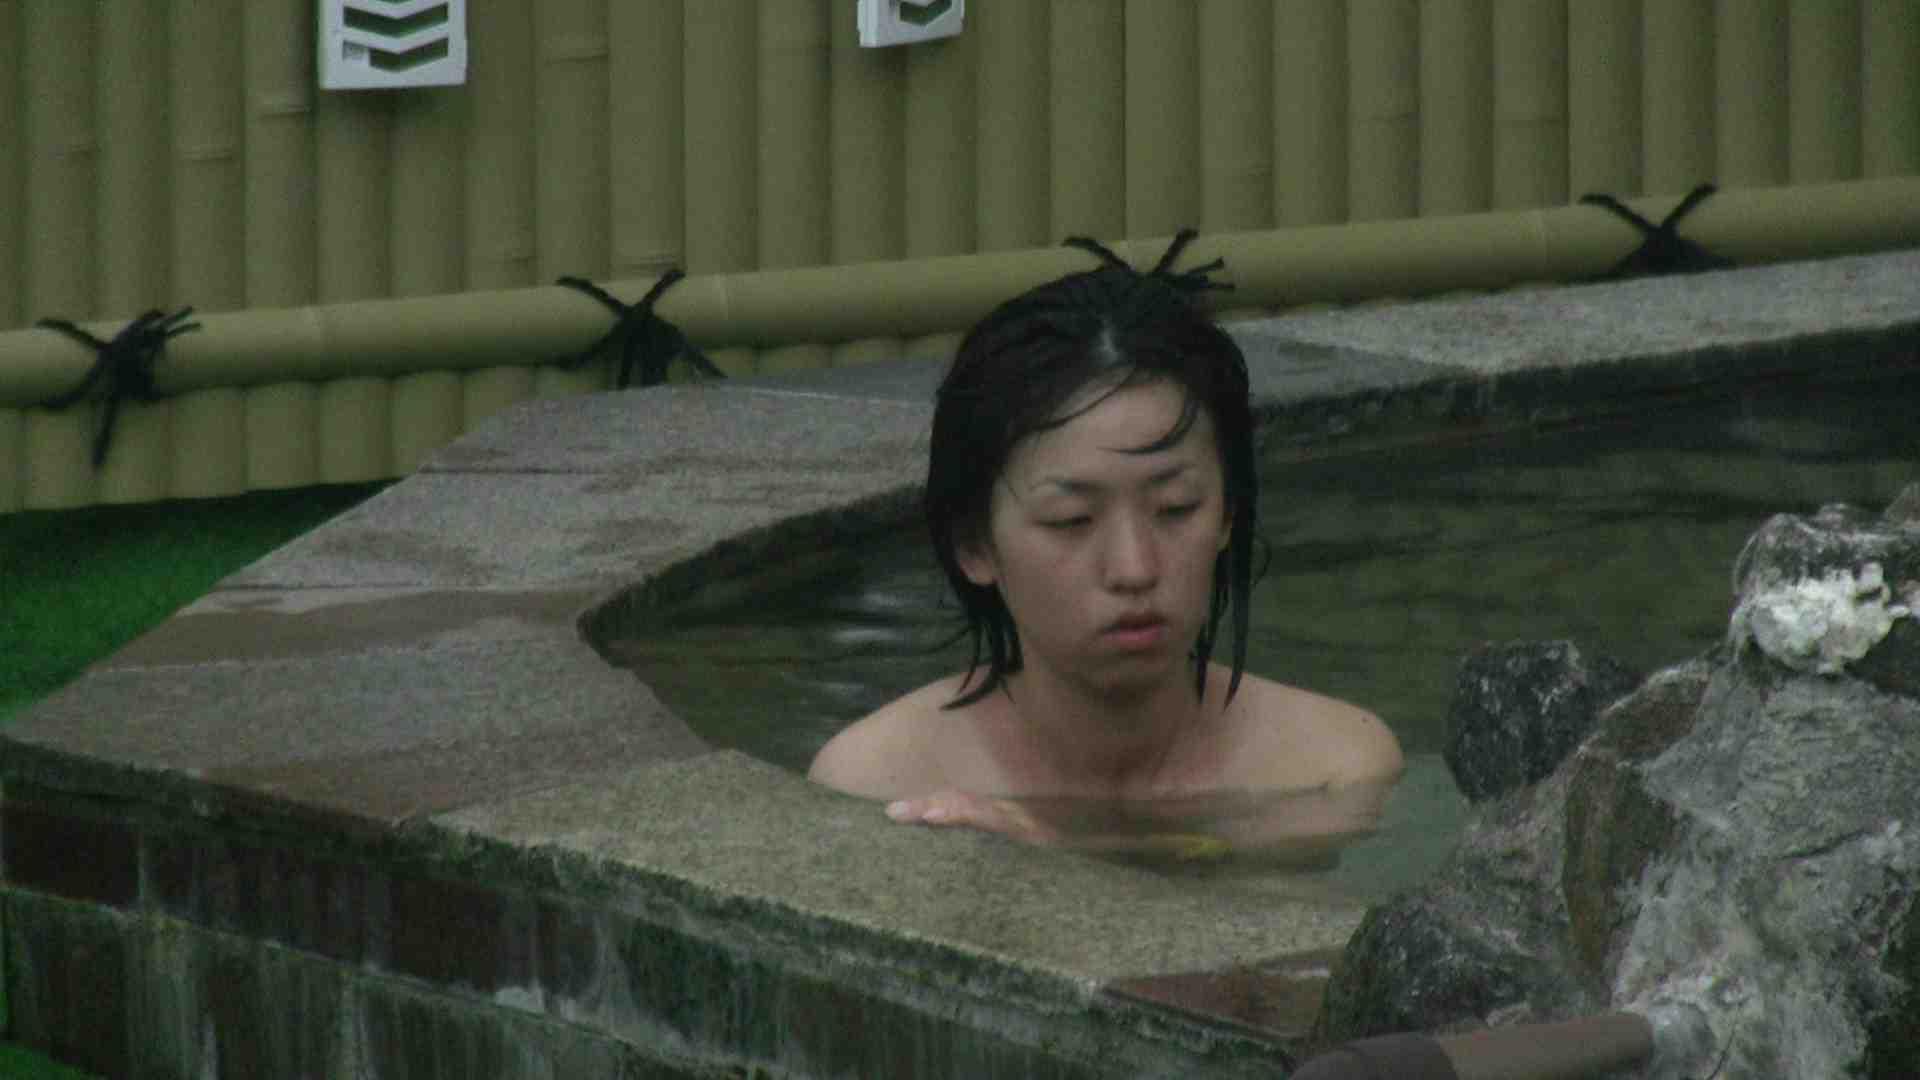 Aquaな露天風呂Vol.170 0  65連発 52